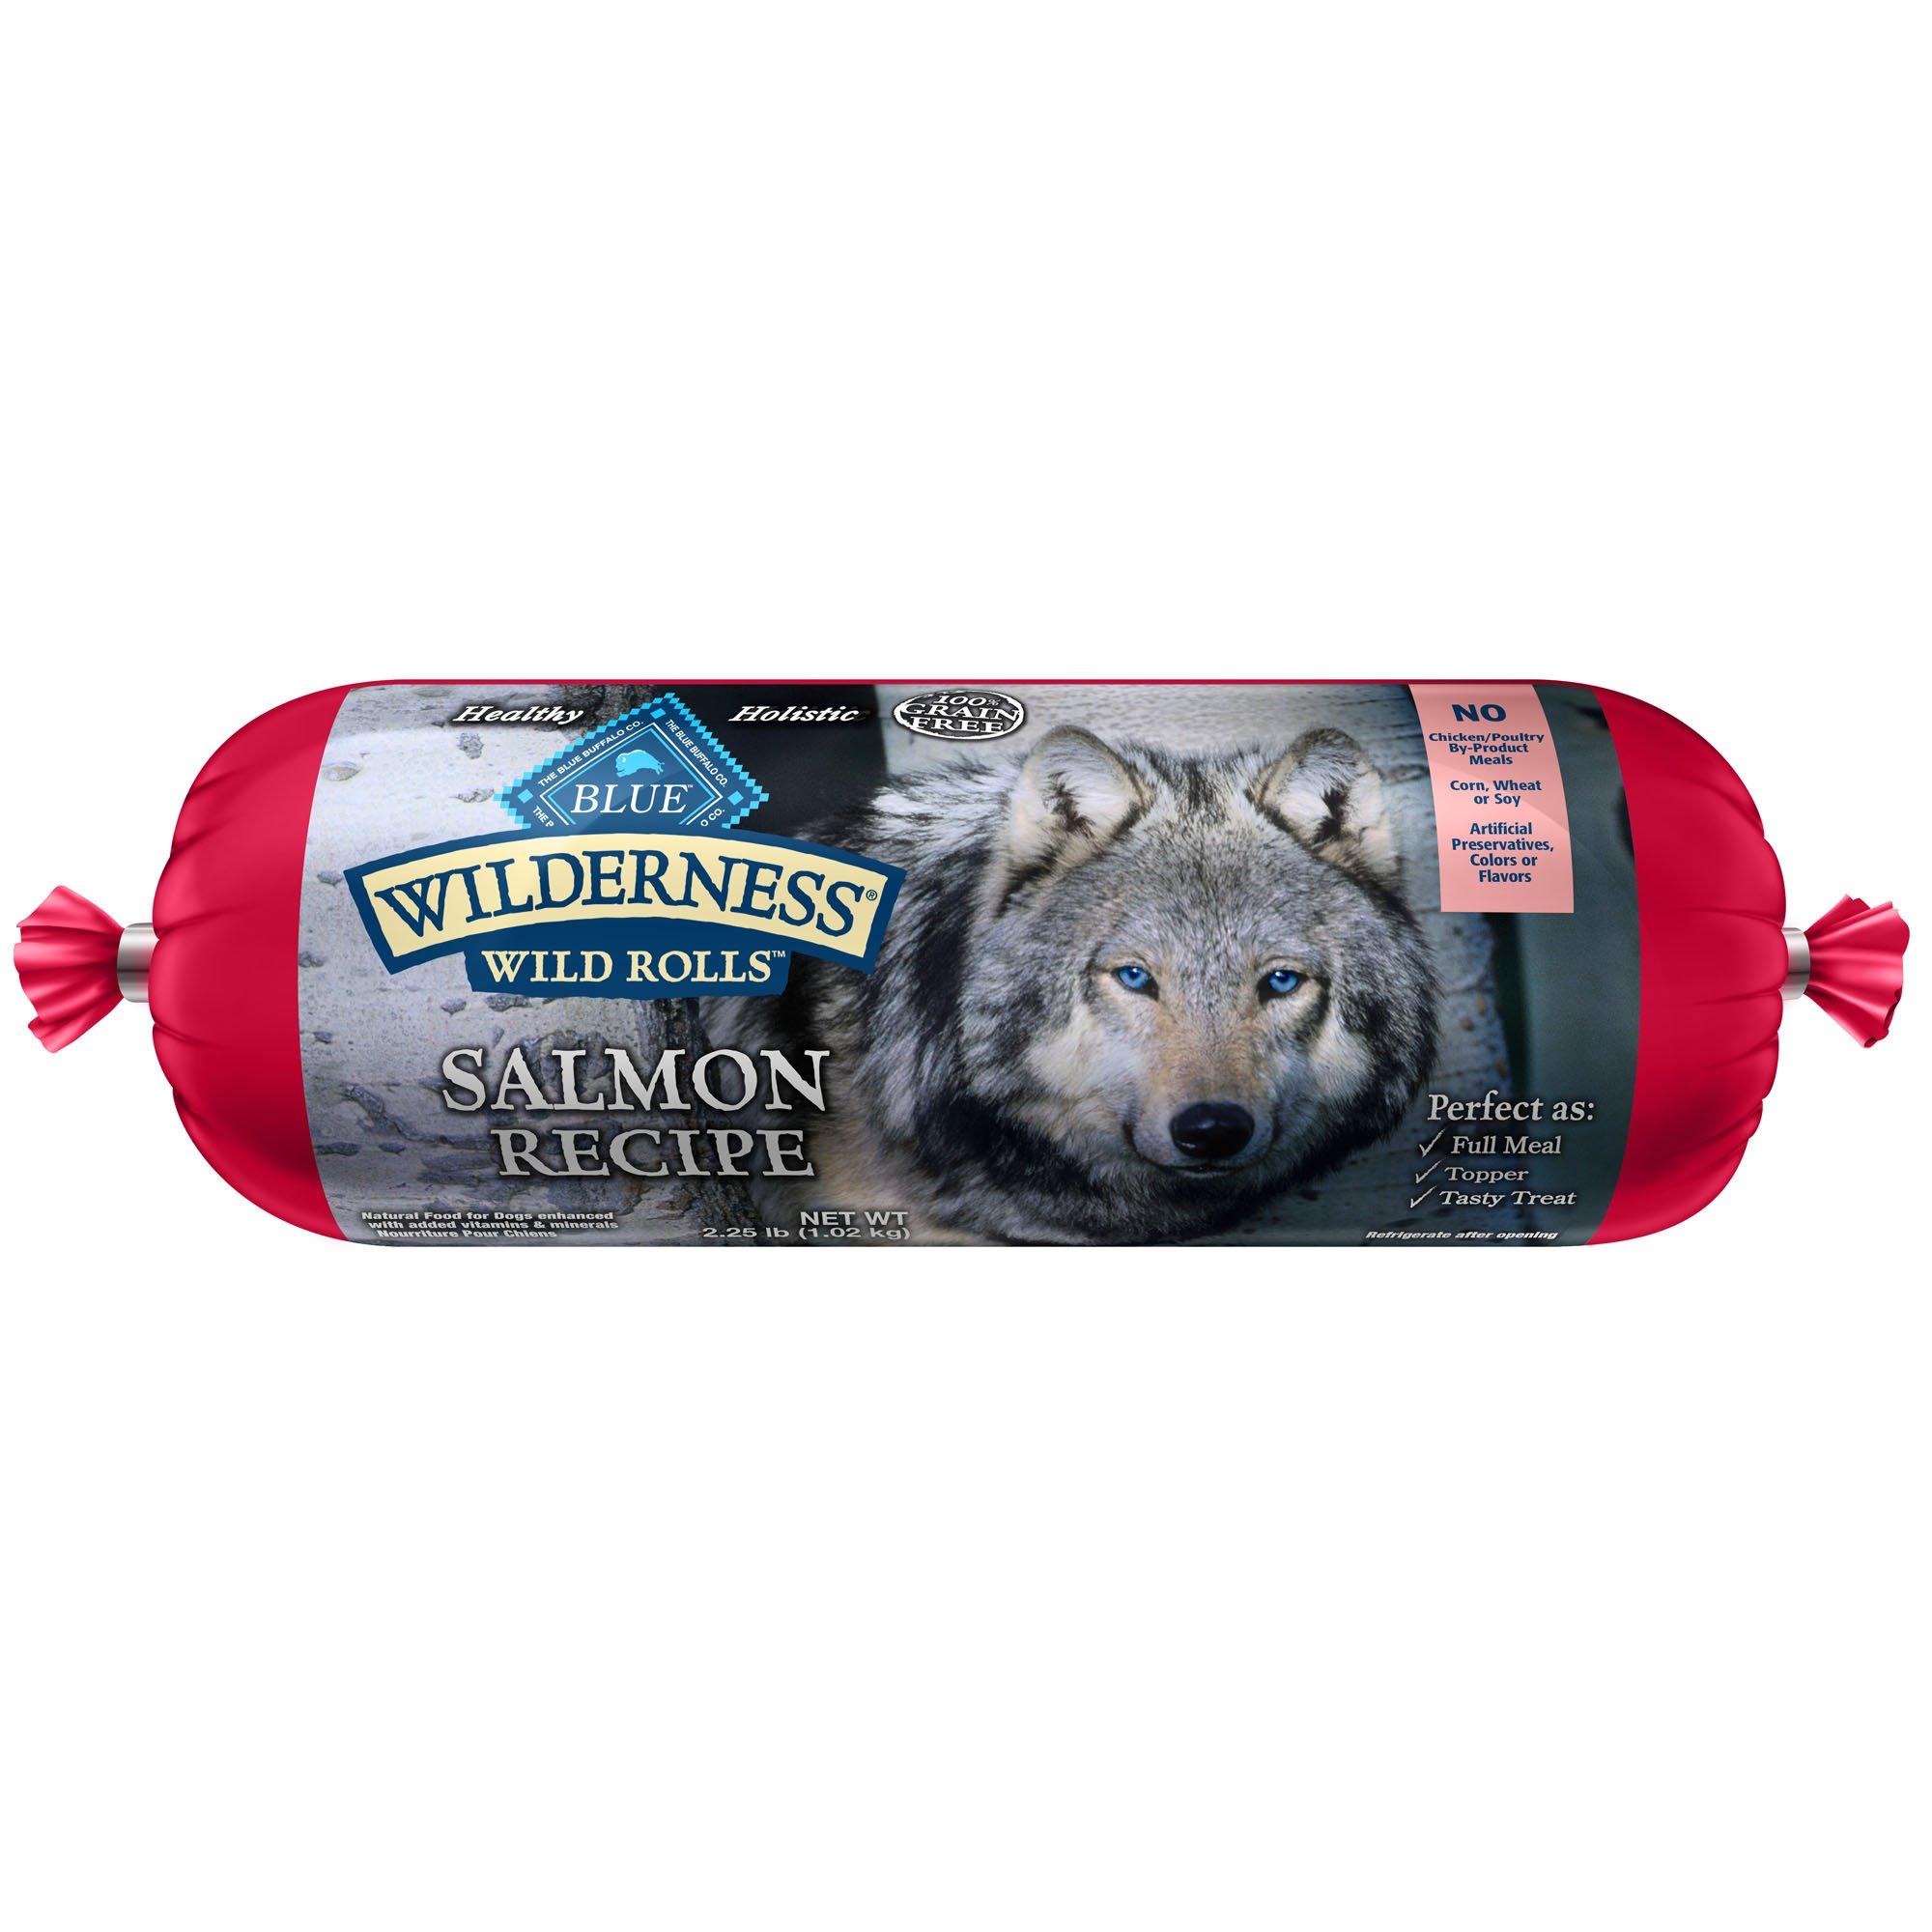 Blue Buffalo Wilderness Wild Roll Salmon Recipe Dog Food